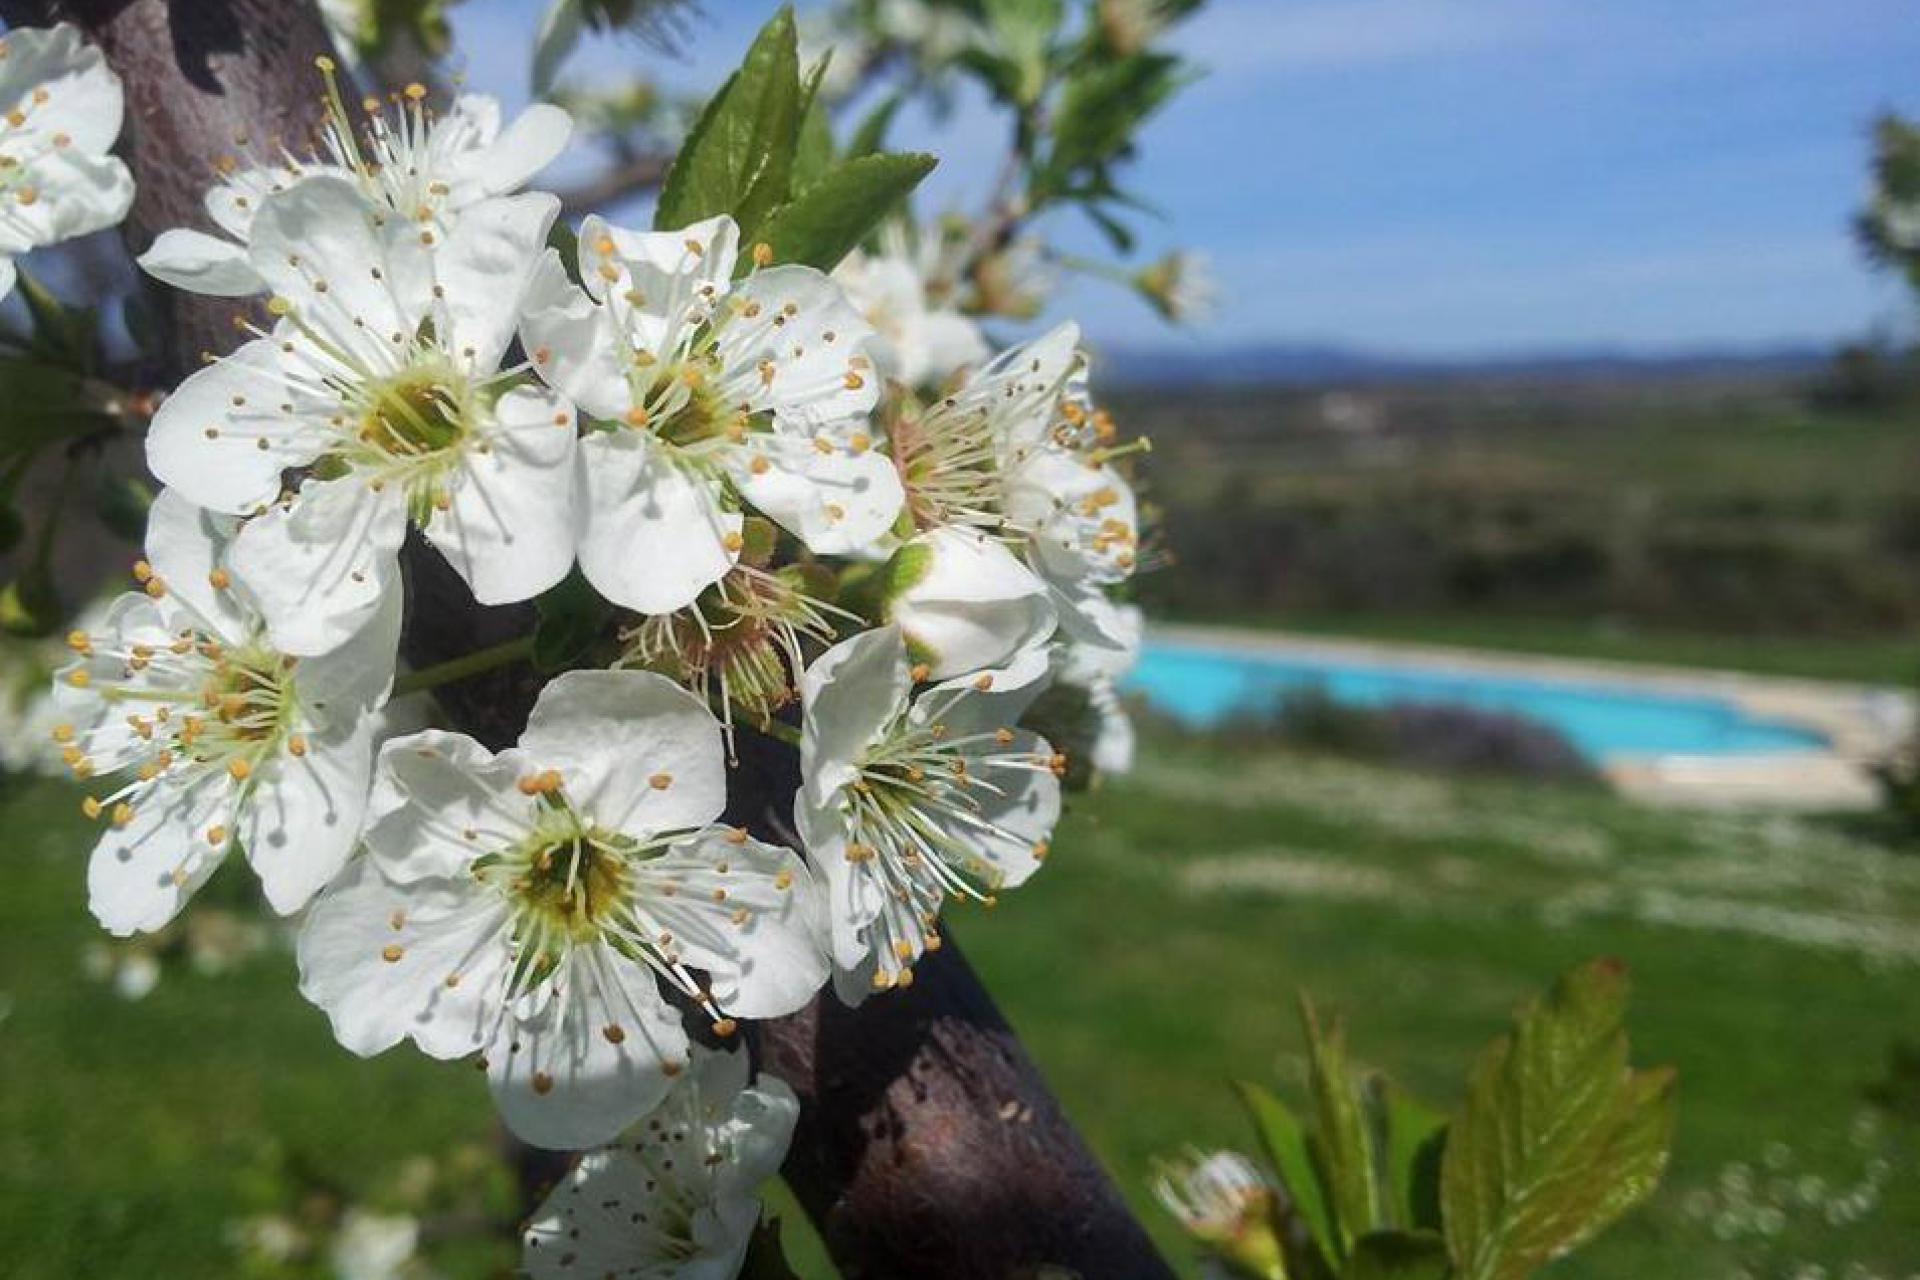 Agriturismo Toskana Agriturismo Toskana, Olivenhain und fantastischer Blick